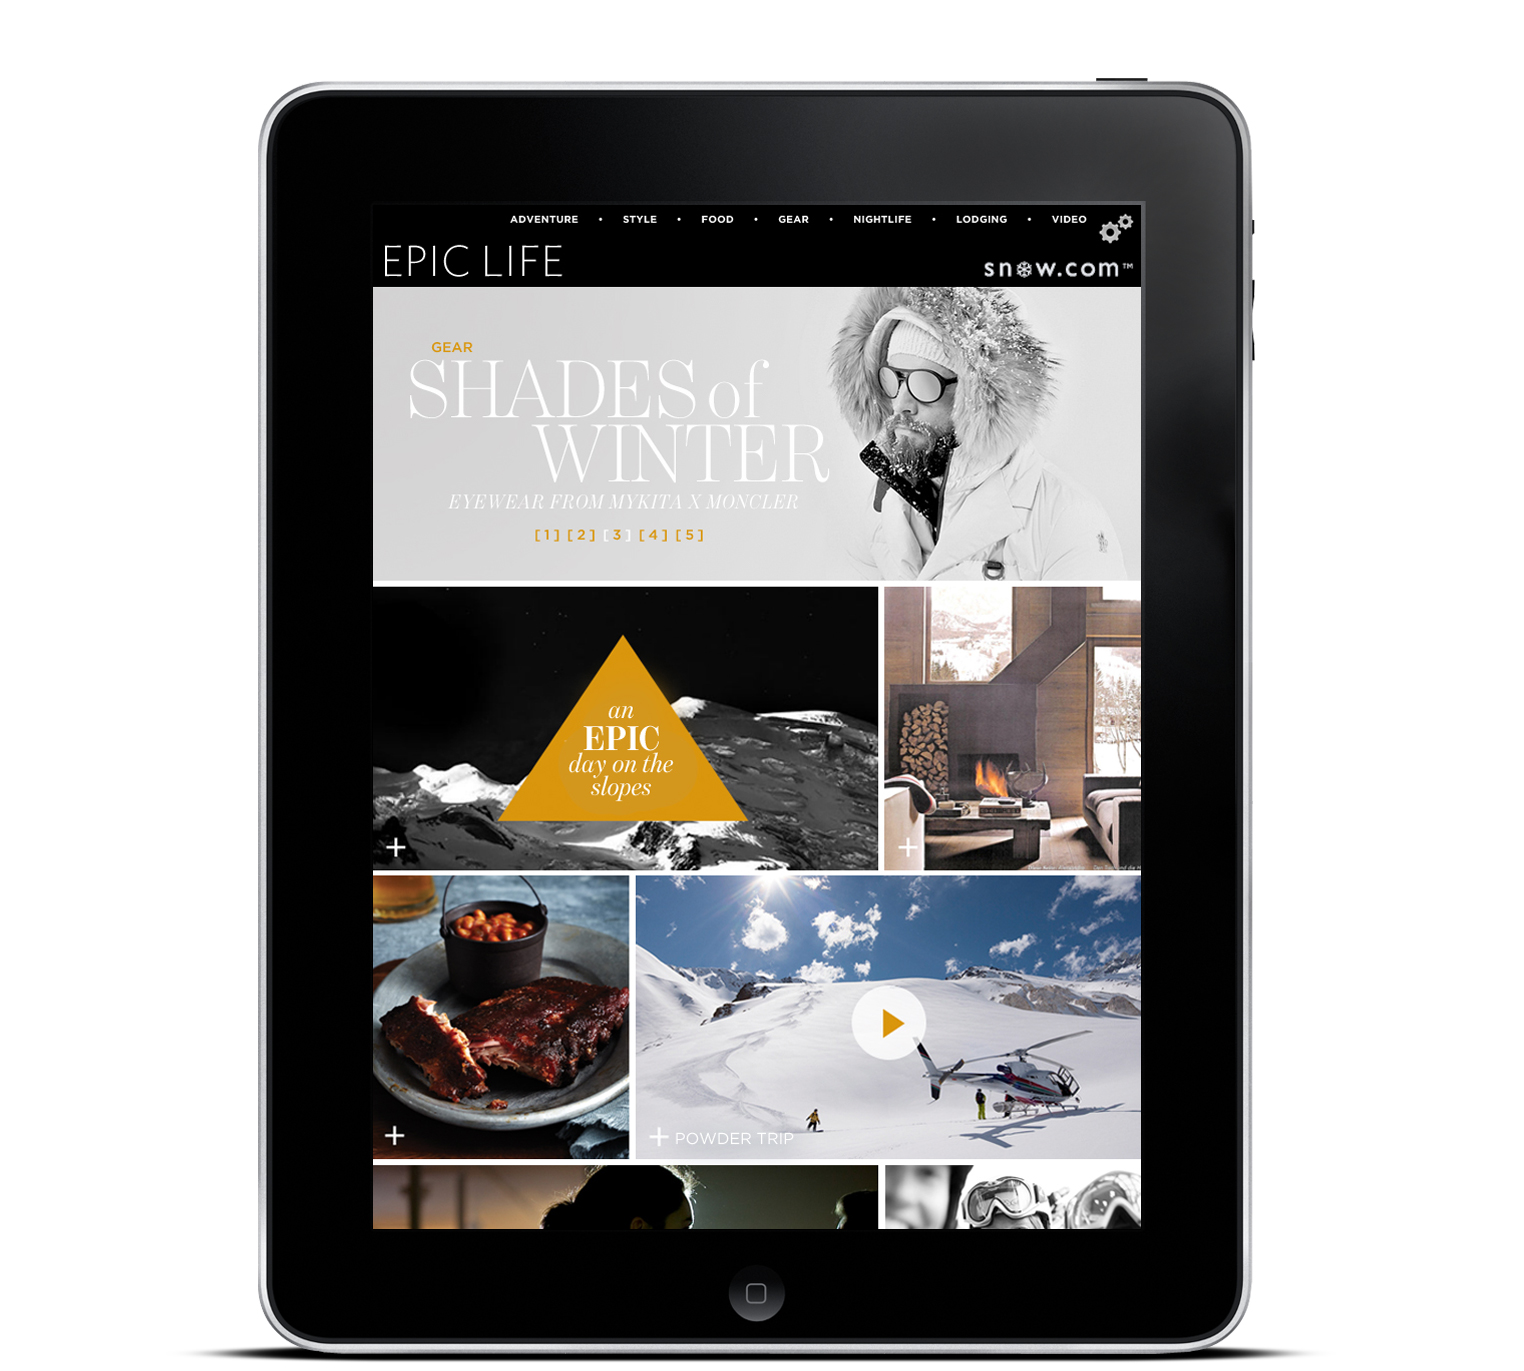 EPIC LIFE Digital Magazine — iPad version